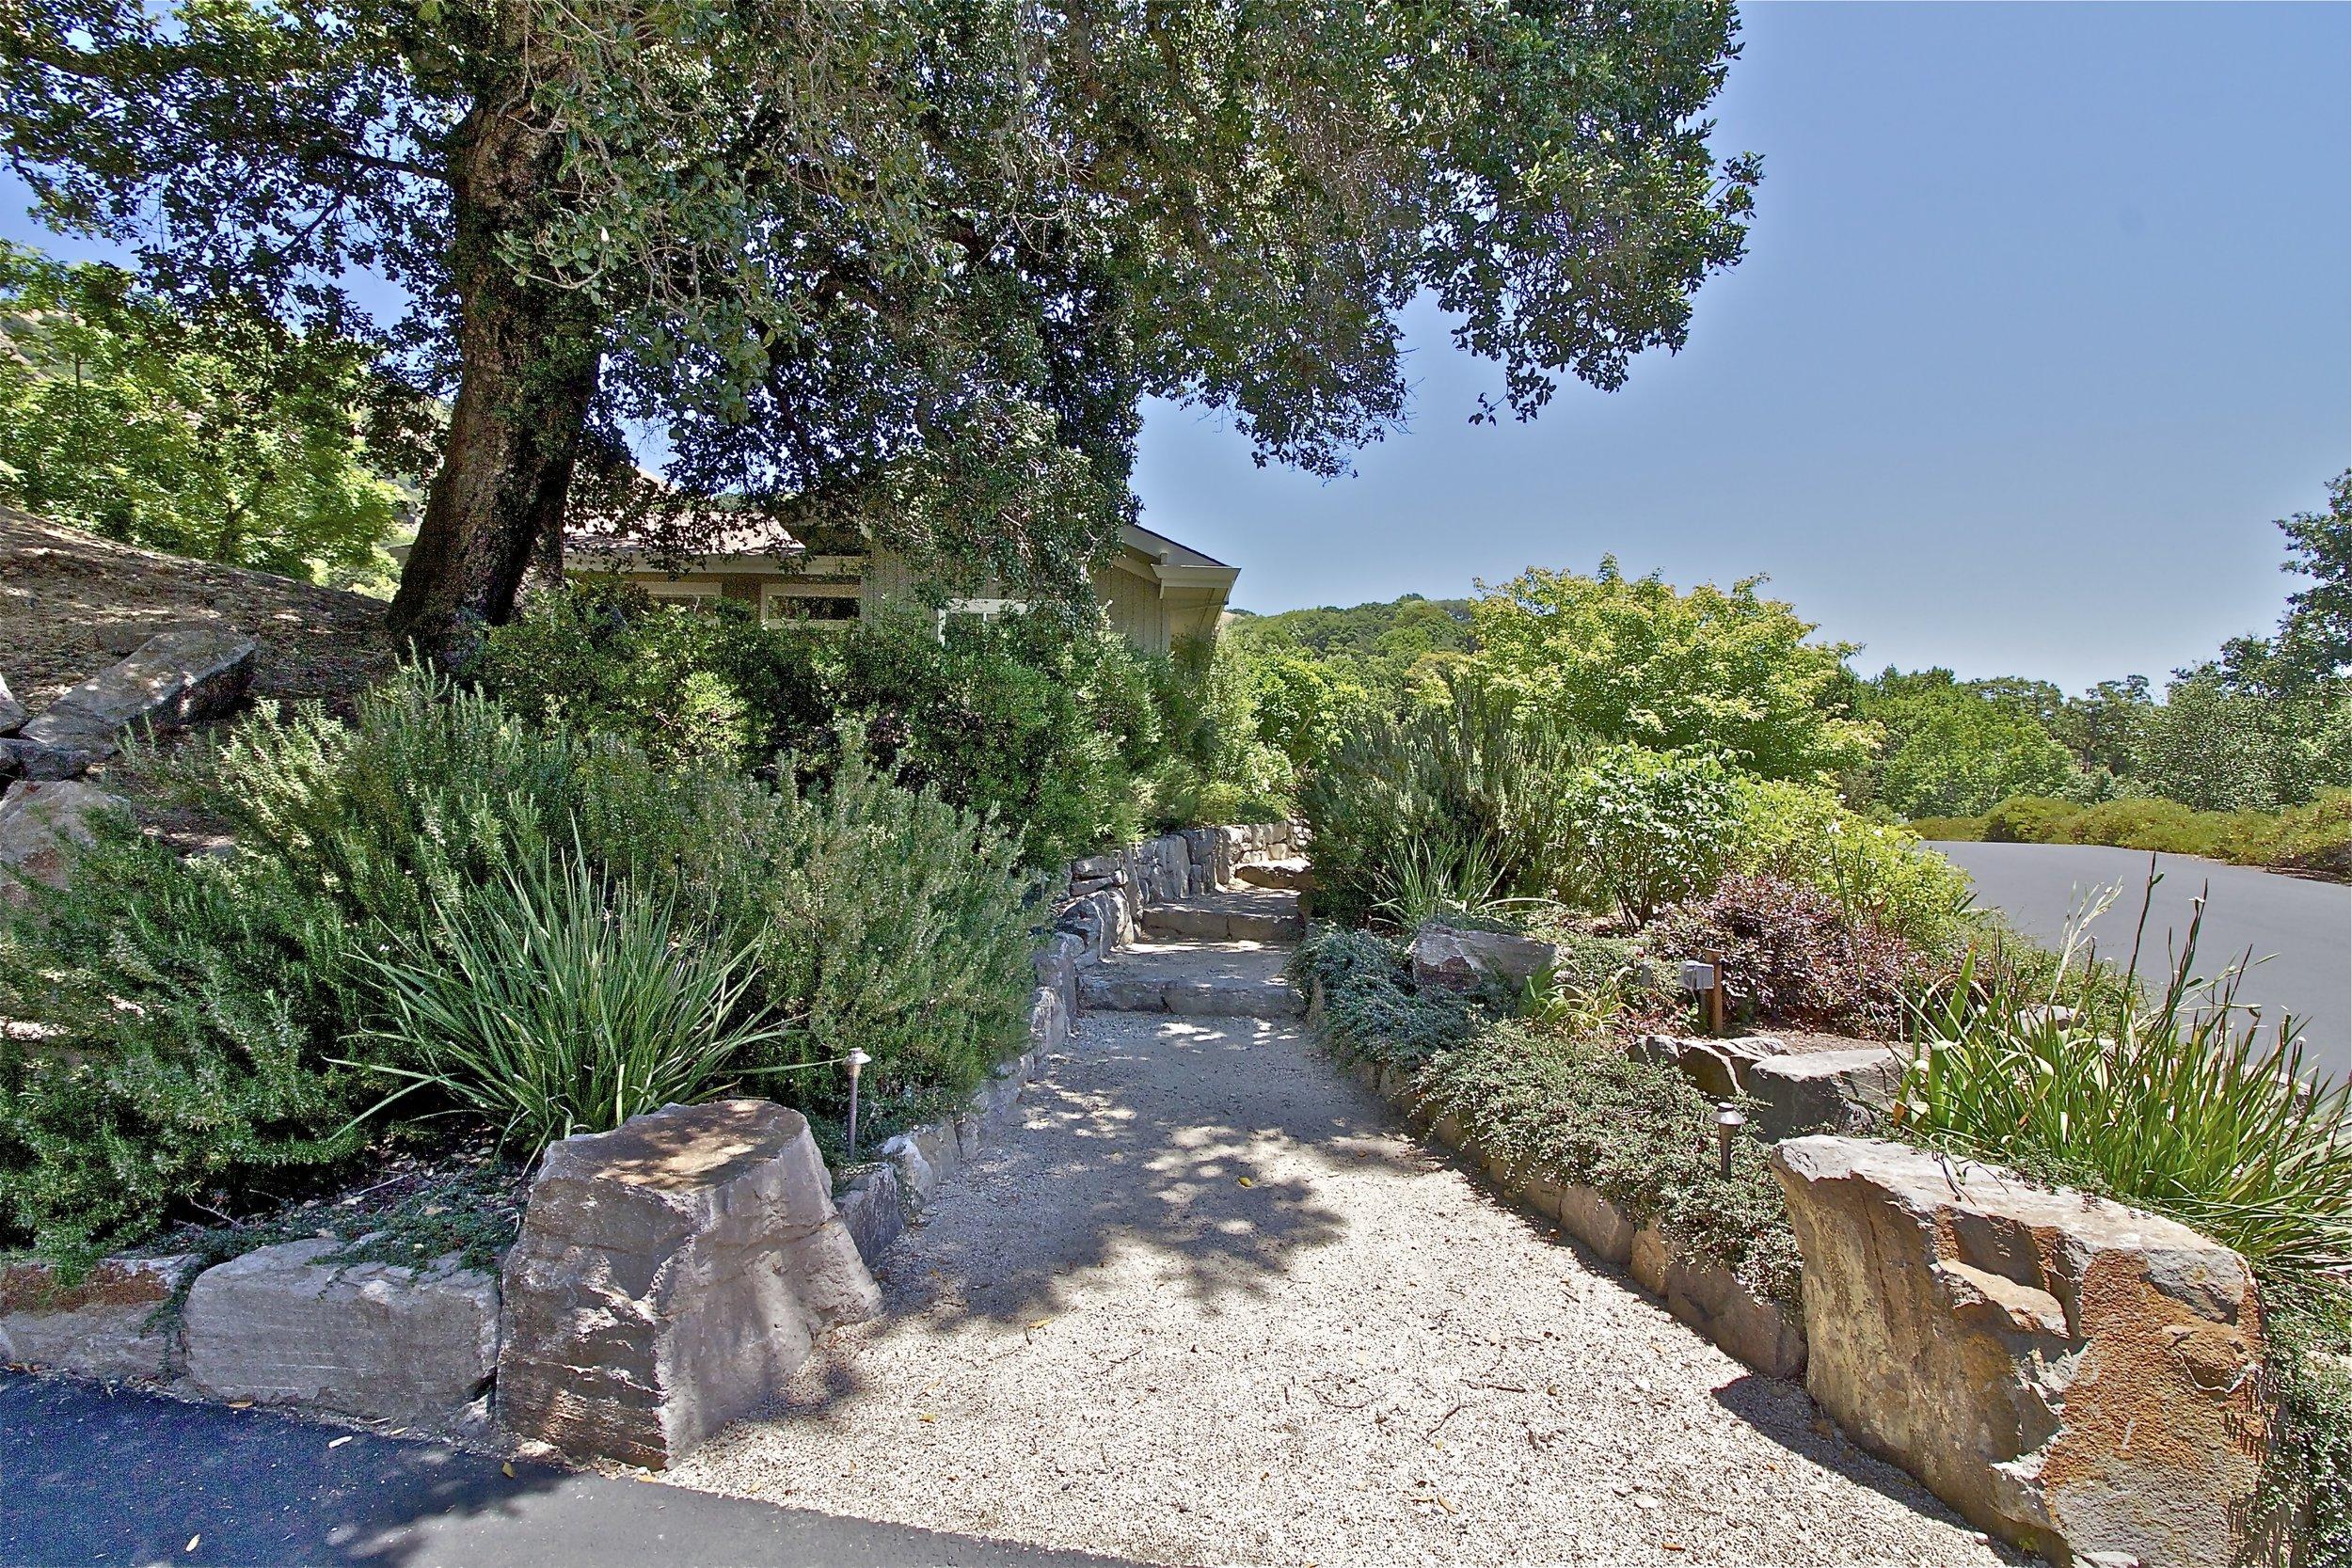 14. Stone pathway - landscaping.jpg